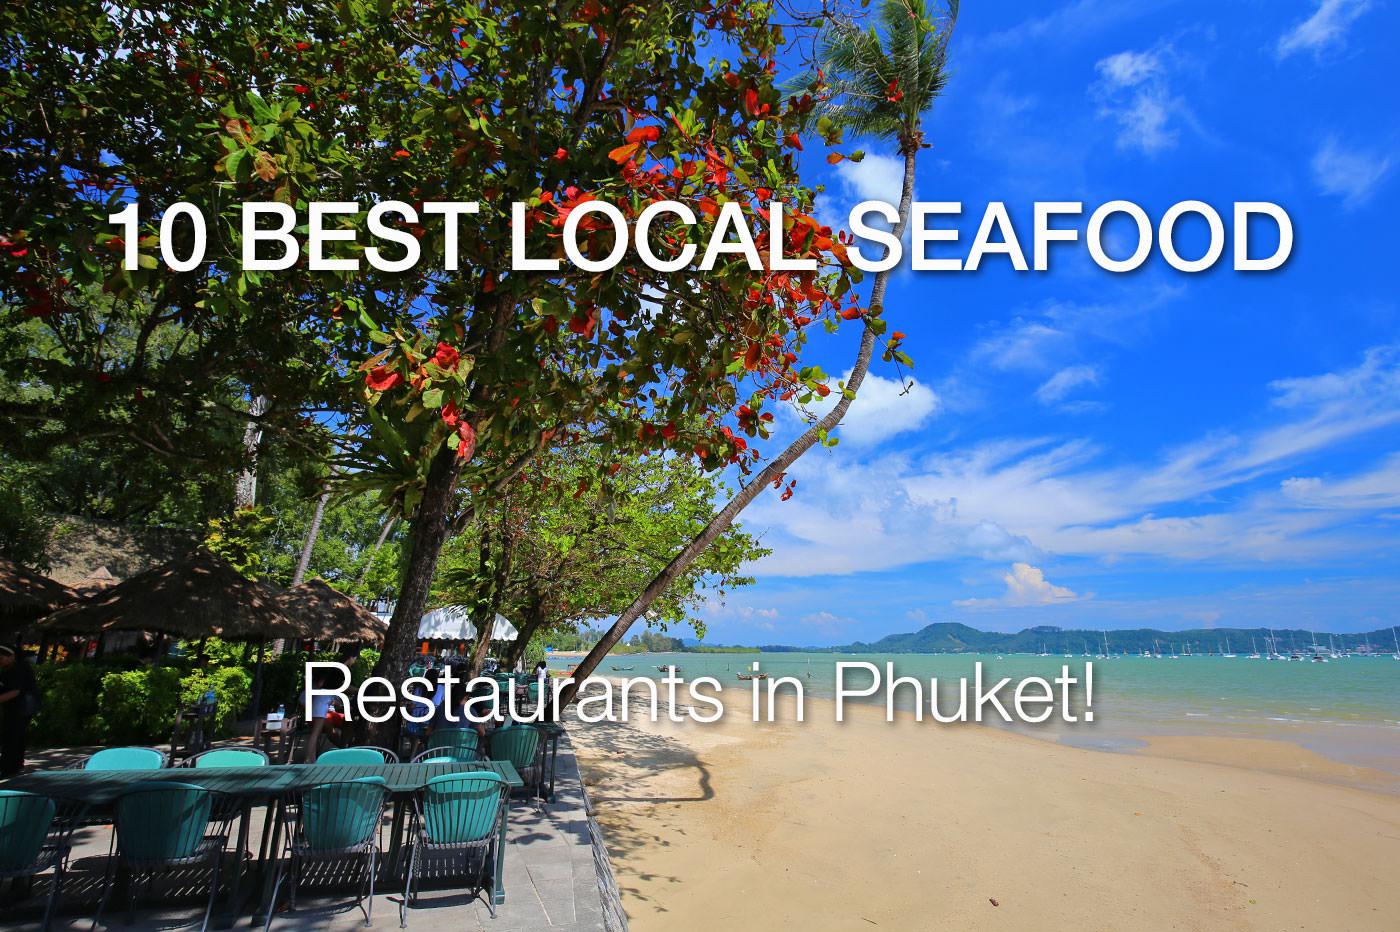 10 Best Local Seafood Restaurants in Phuket (updated)